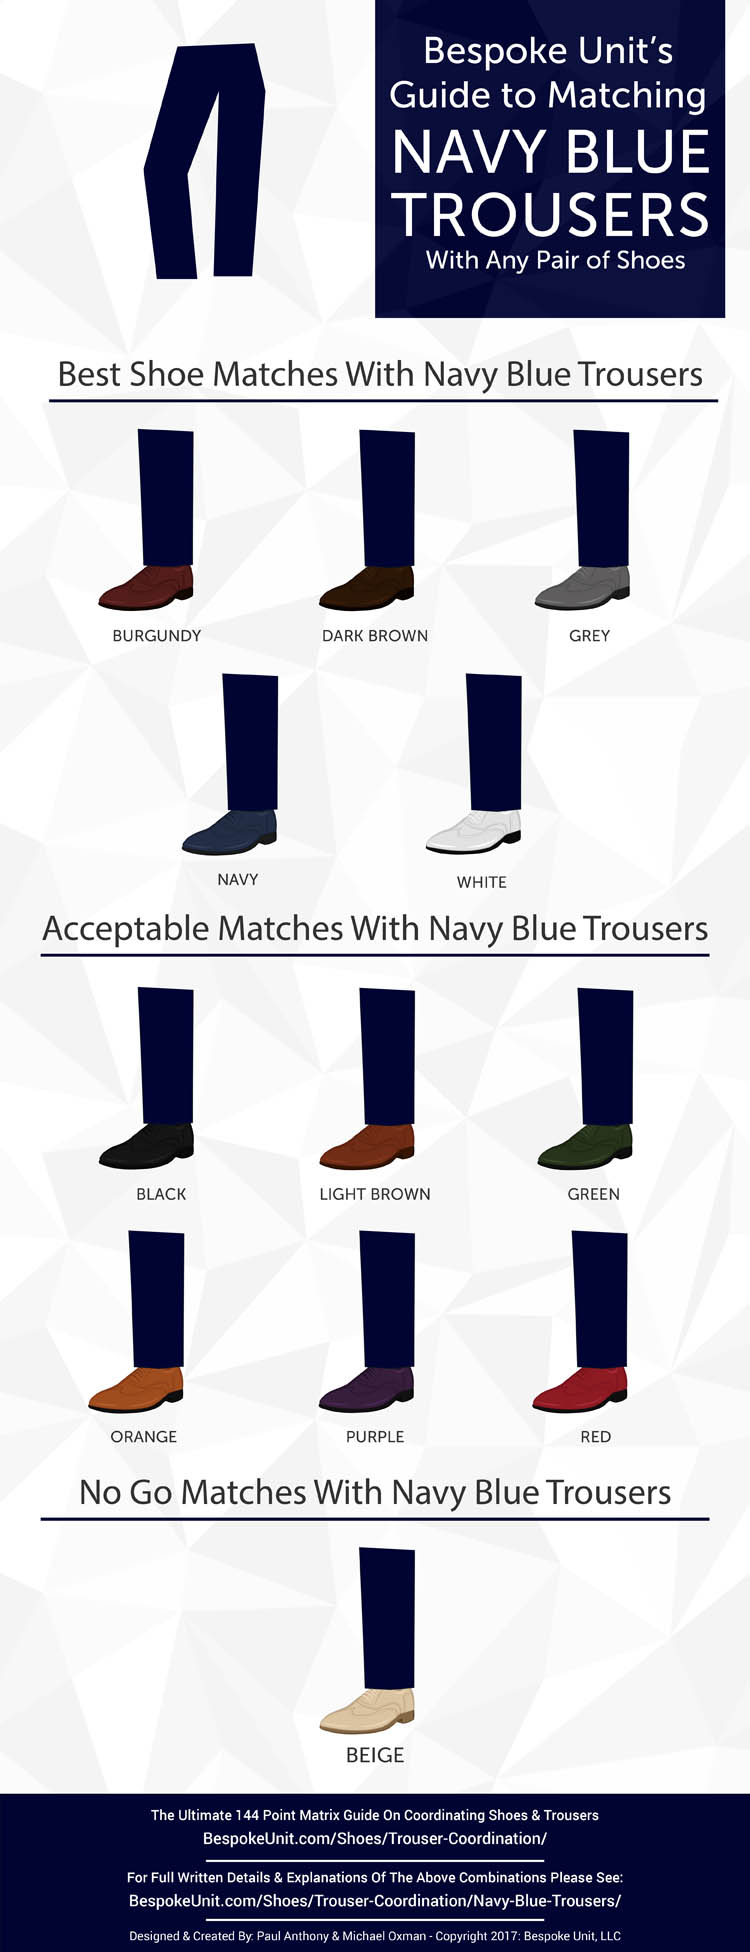 Navy-Trouser-Coordination-Graphic-Bespoke-Unit.jpg